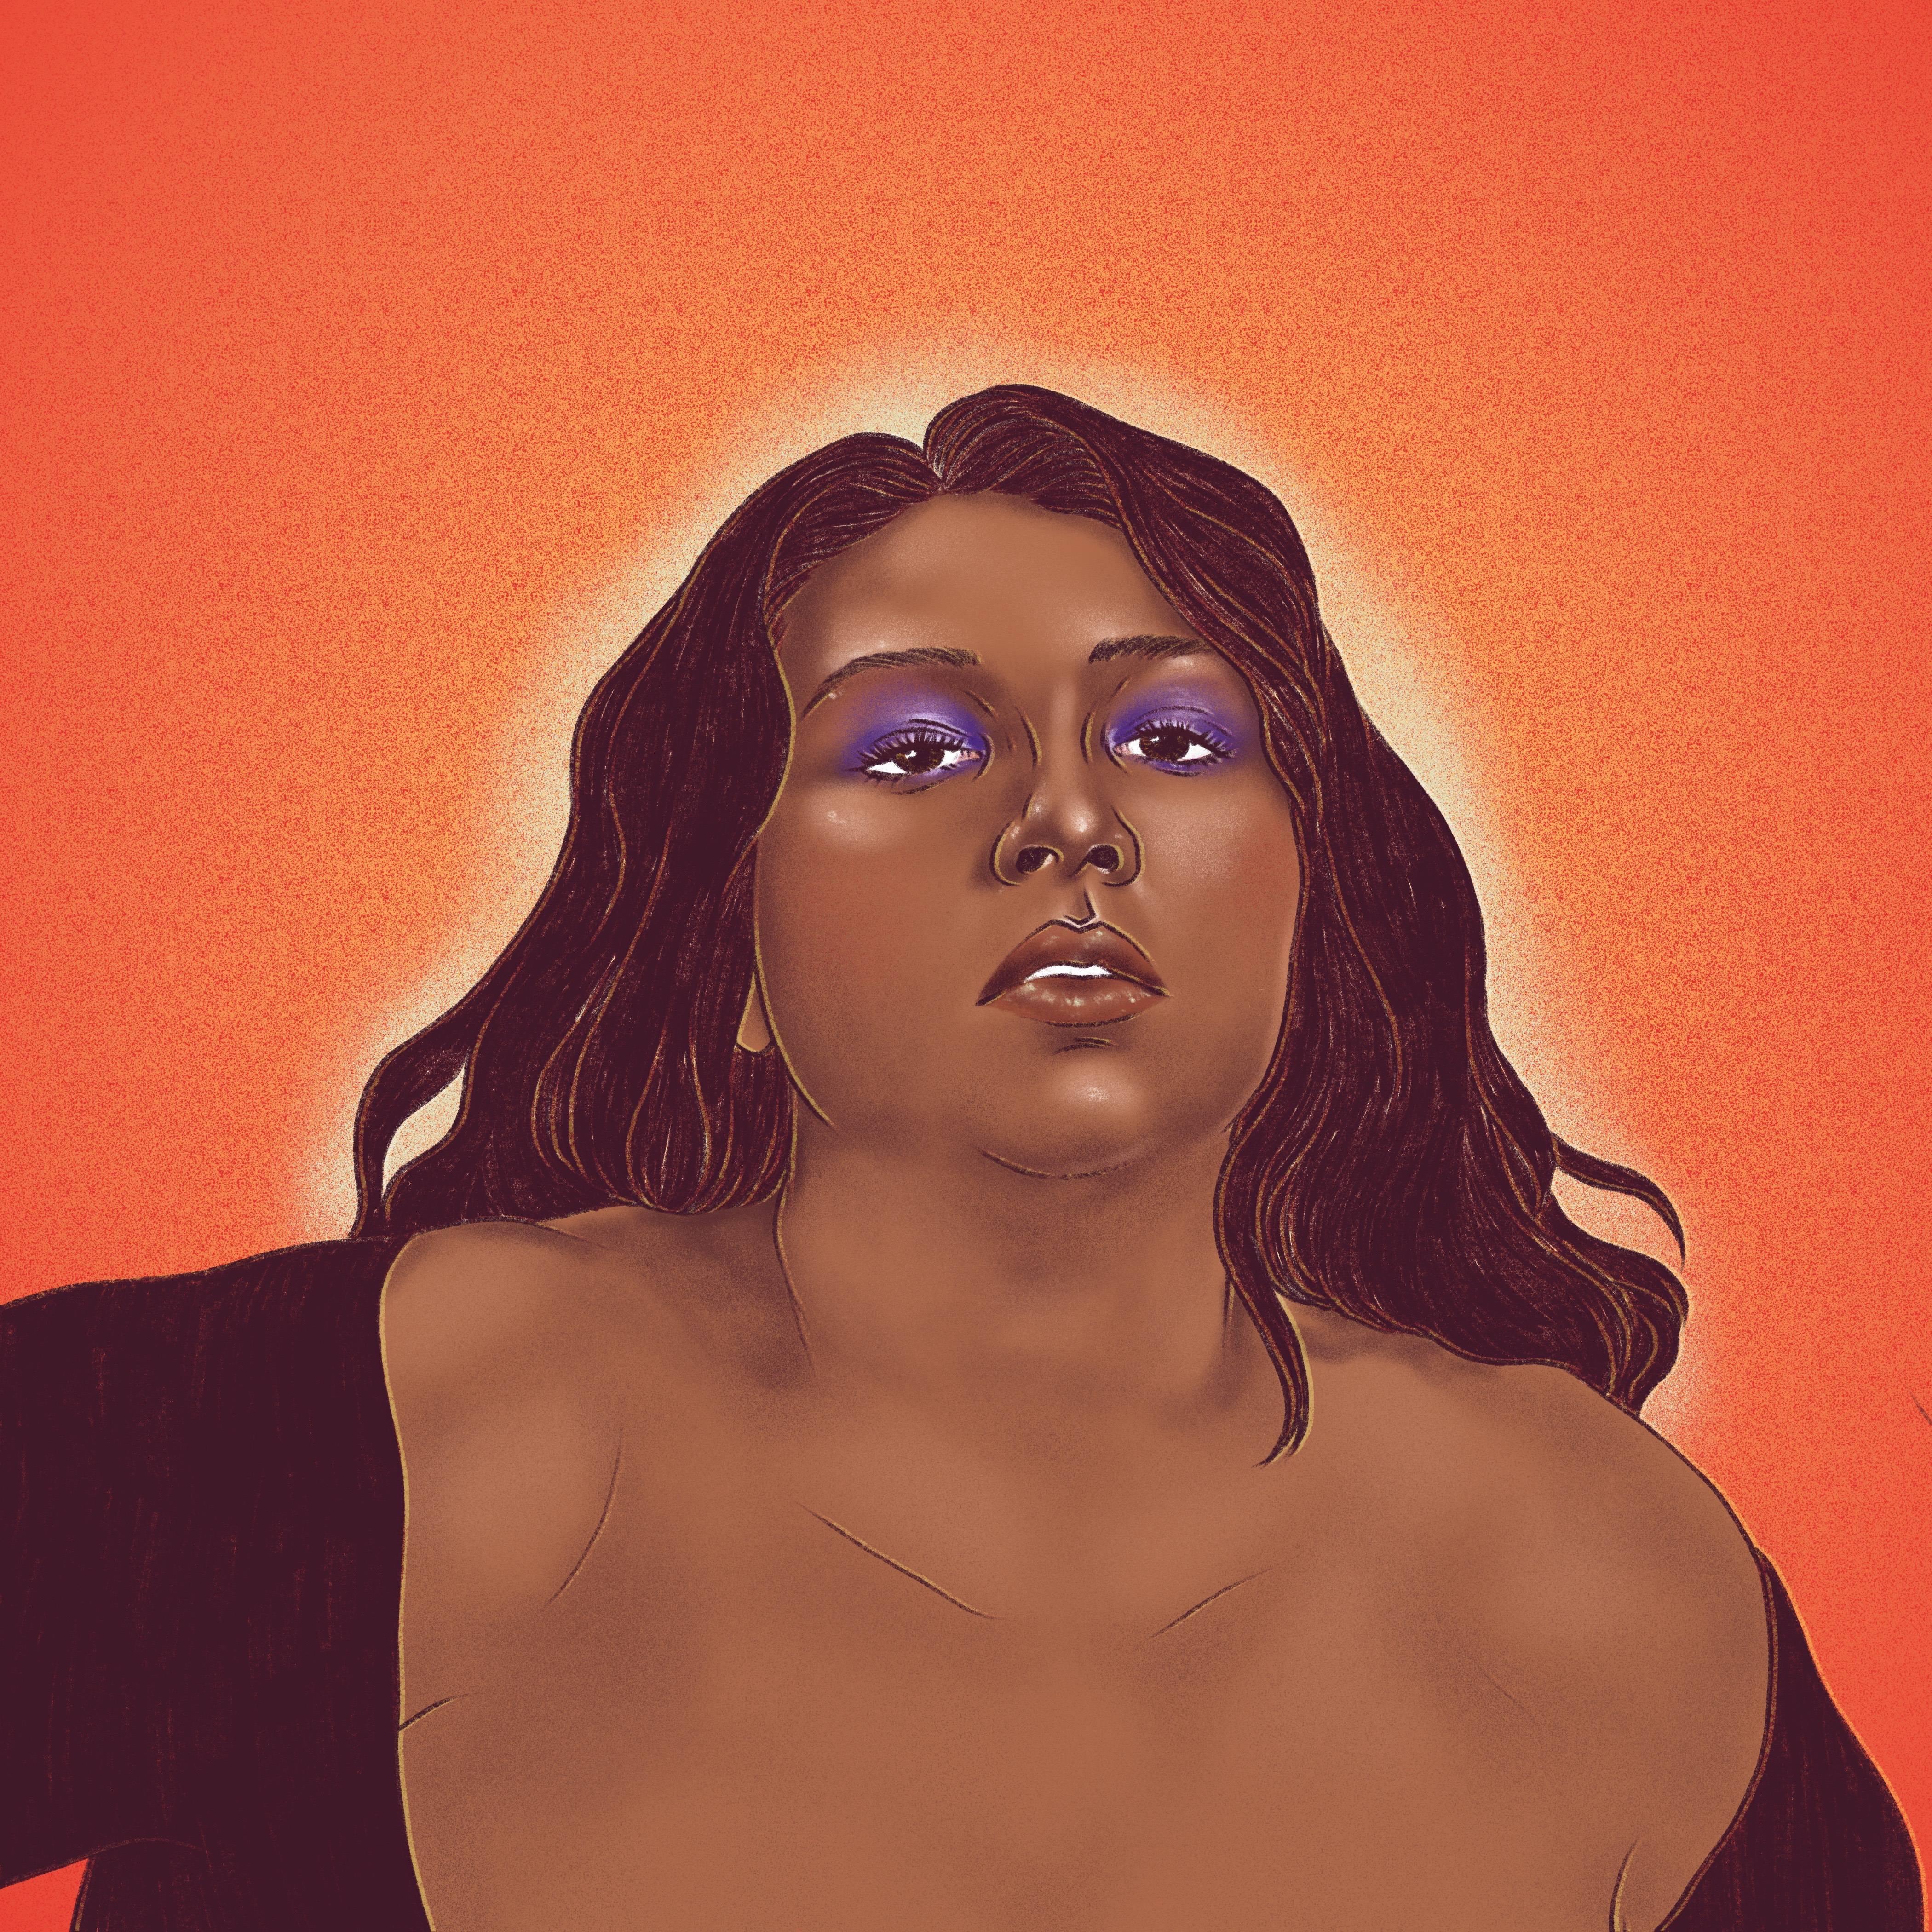 2020 VMA | Artist Spotlight Flipbook Lizzo by Rachelle Baker-Martin